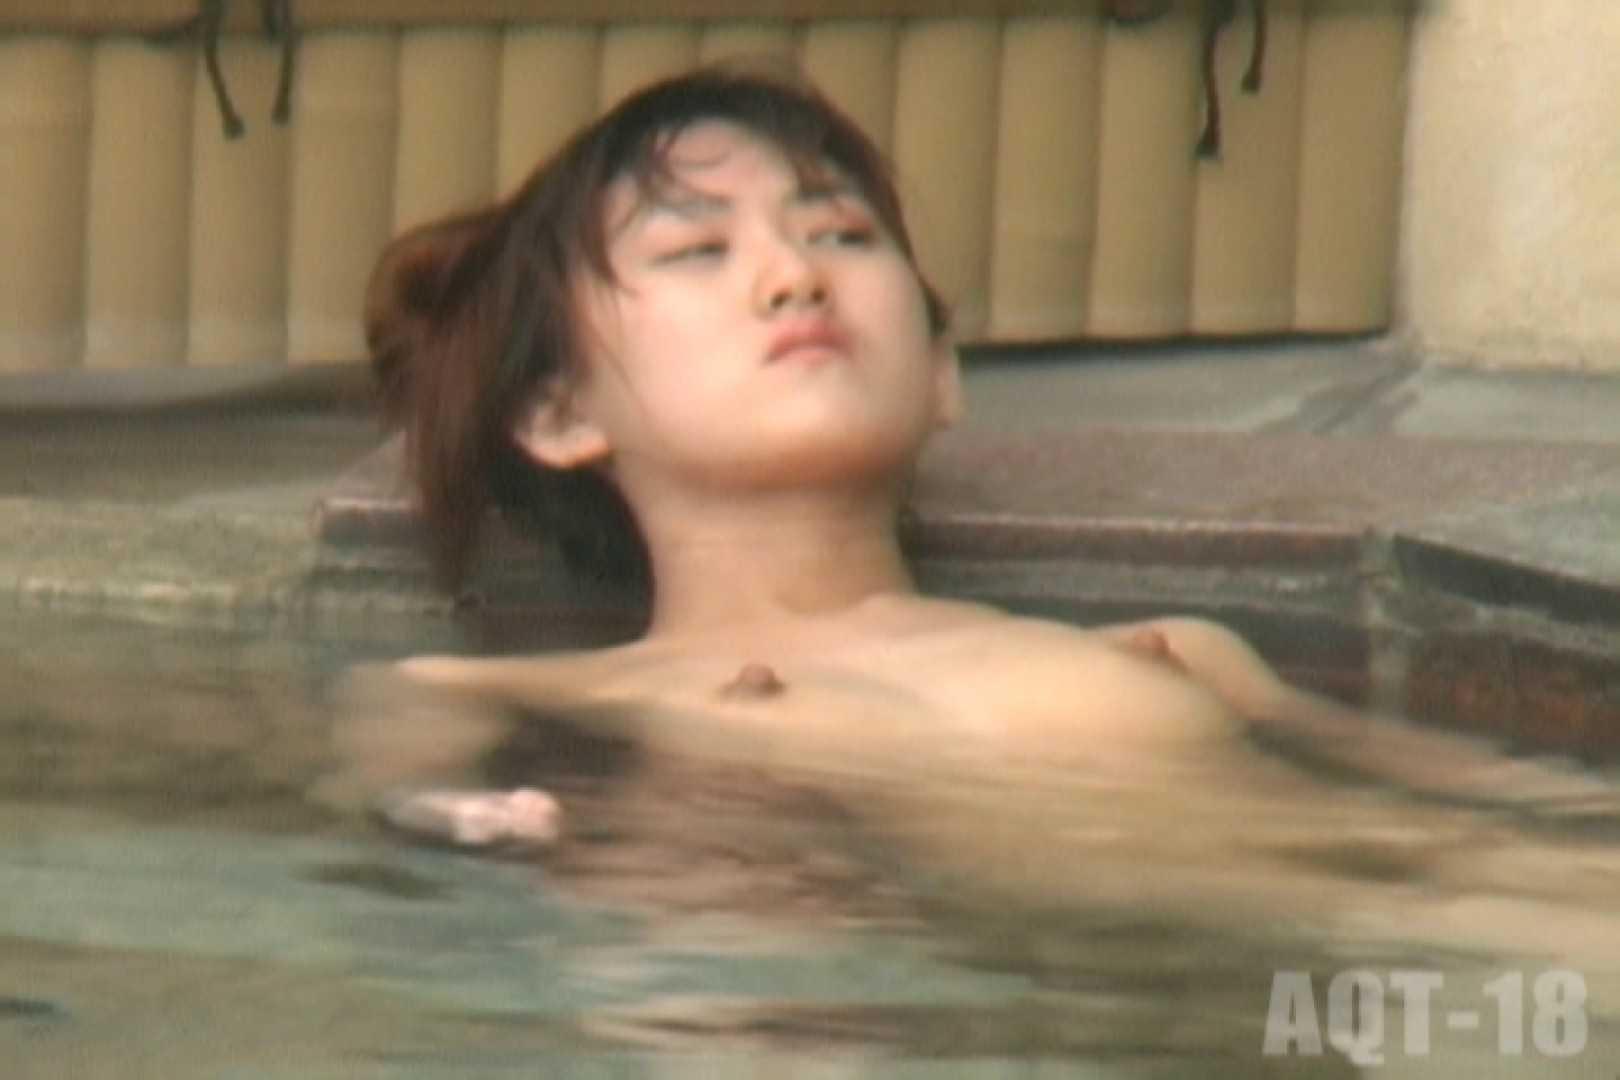 Aquaな露天風呂Vol.862 盗撮師作品  99pic 27